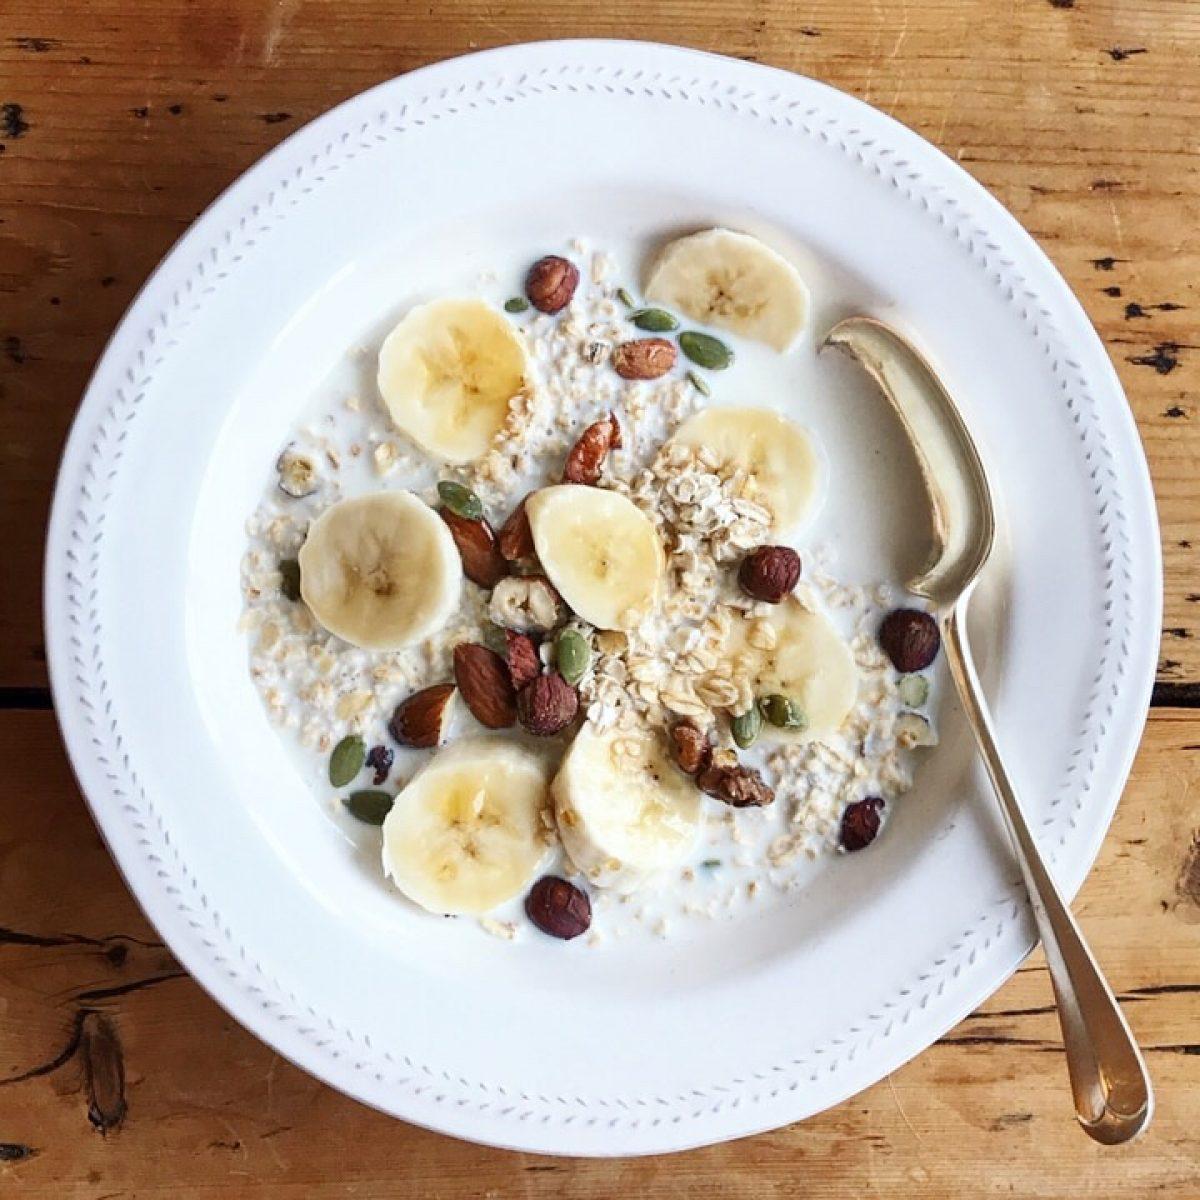 Cool porridge